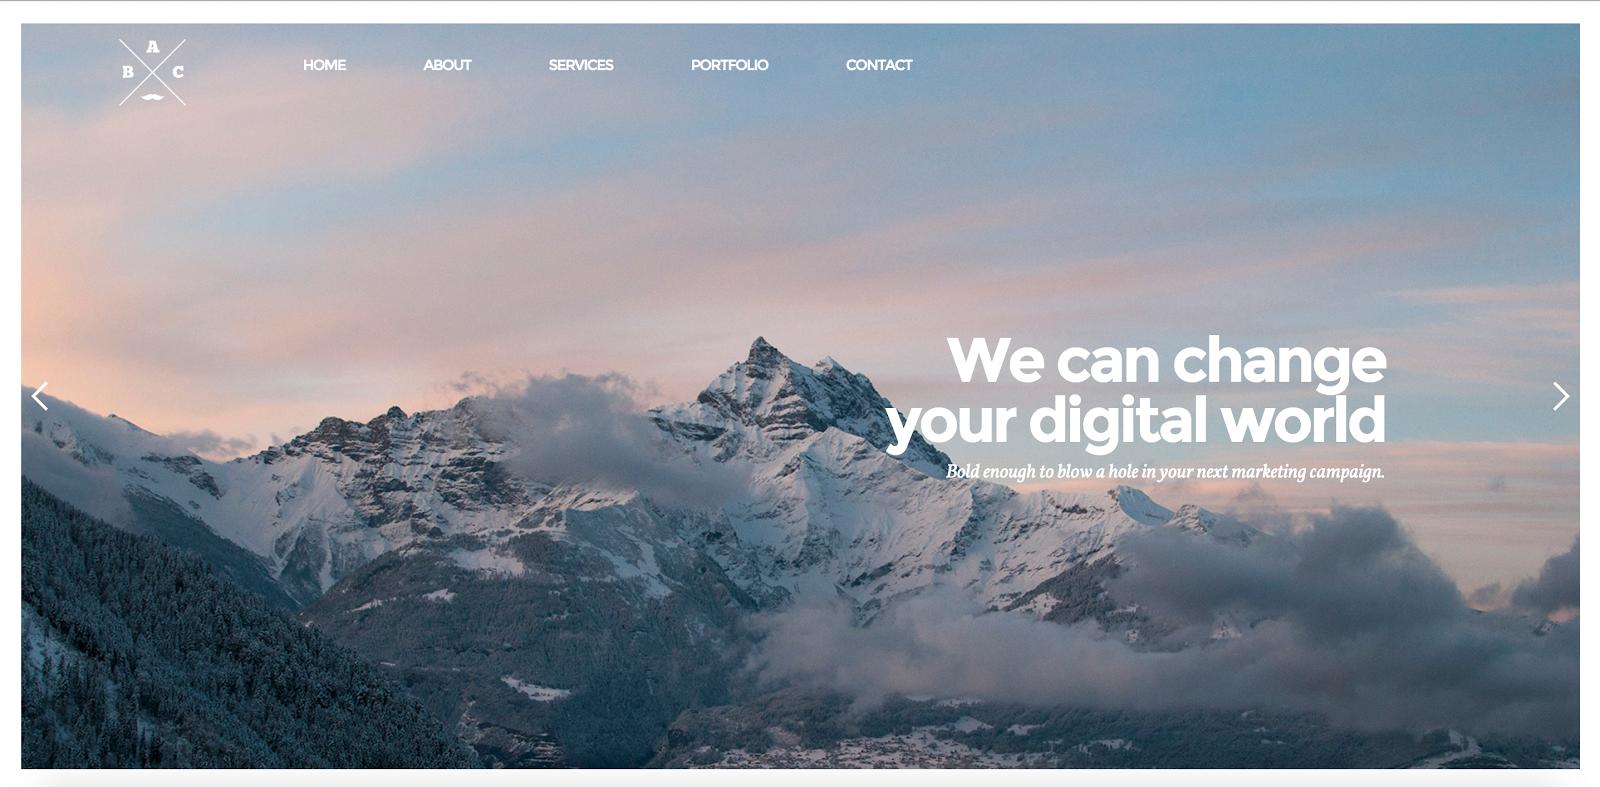 Bold headline + epic photo = Agency website template!